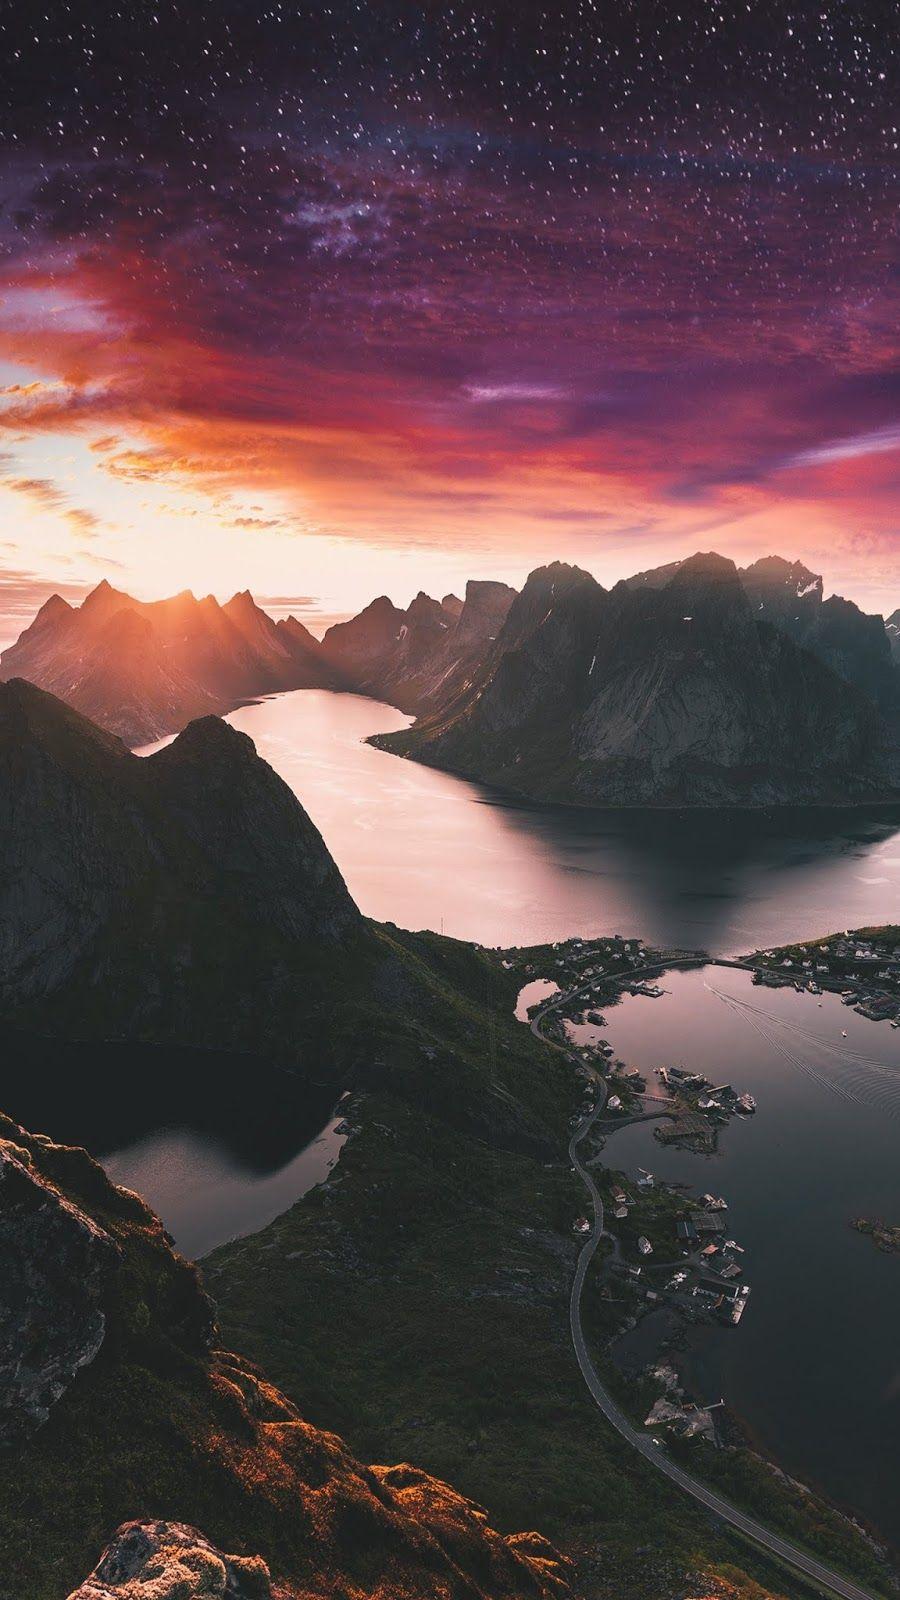 Starry Mountain Night Iphone Wallpaper Landscape Scenery Beautiful Nature